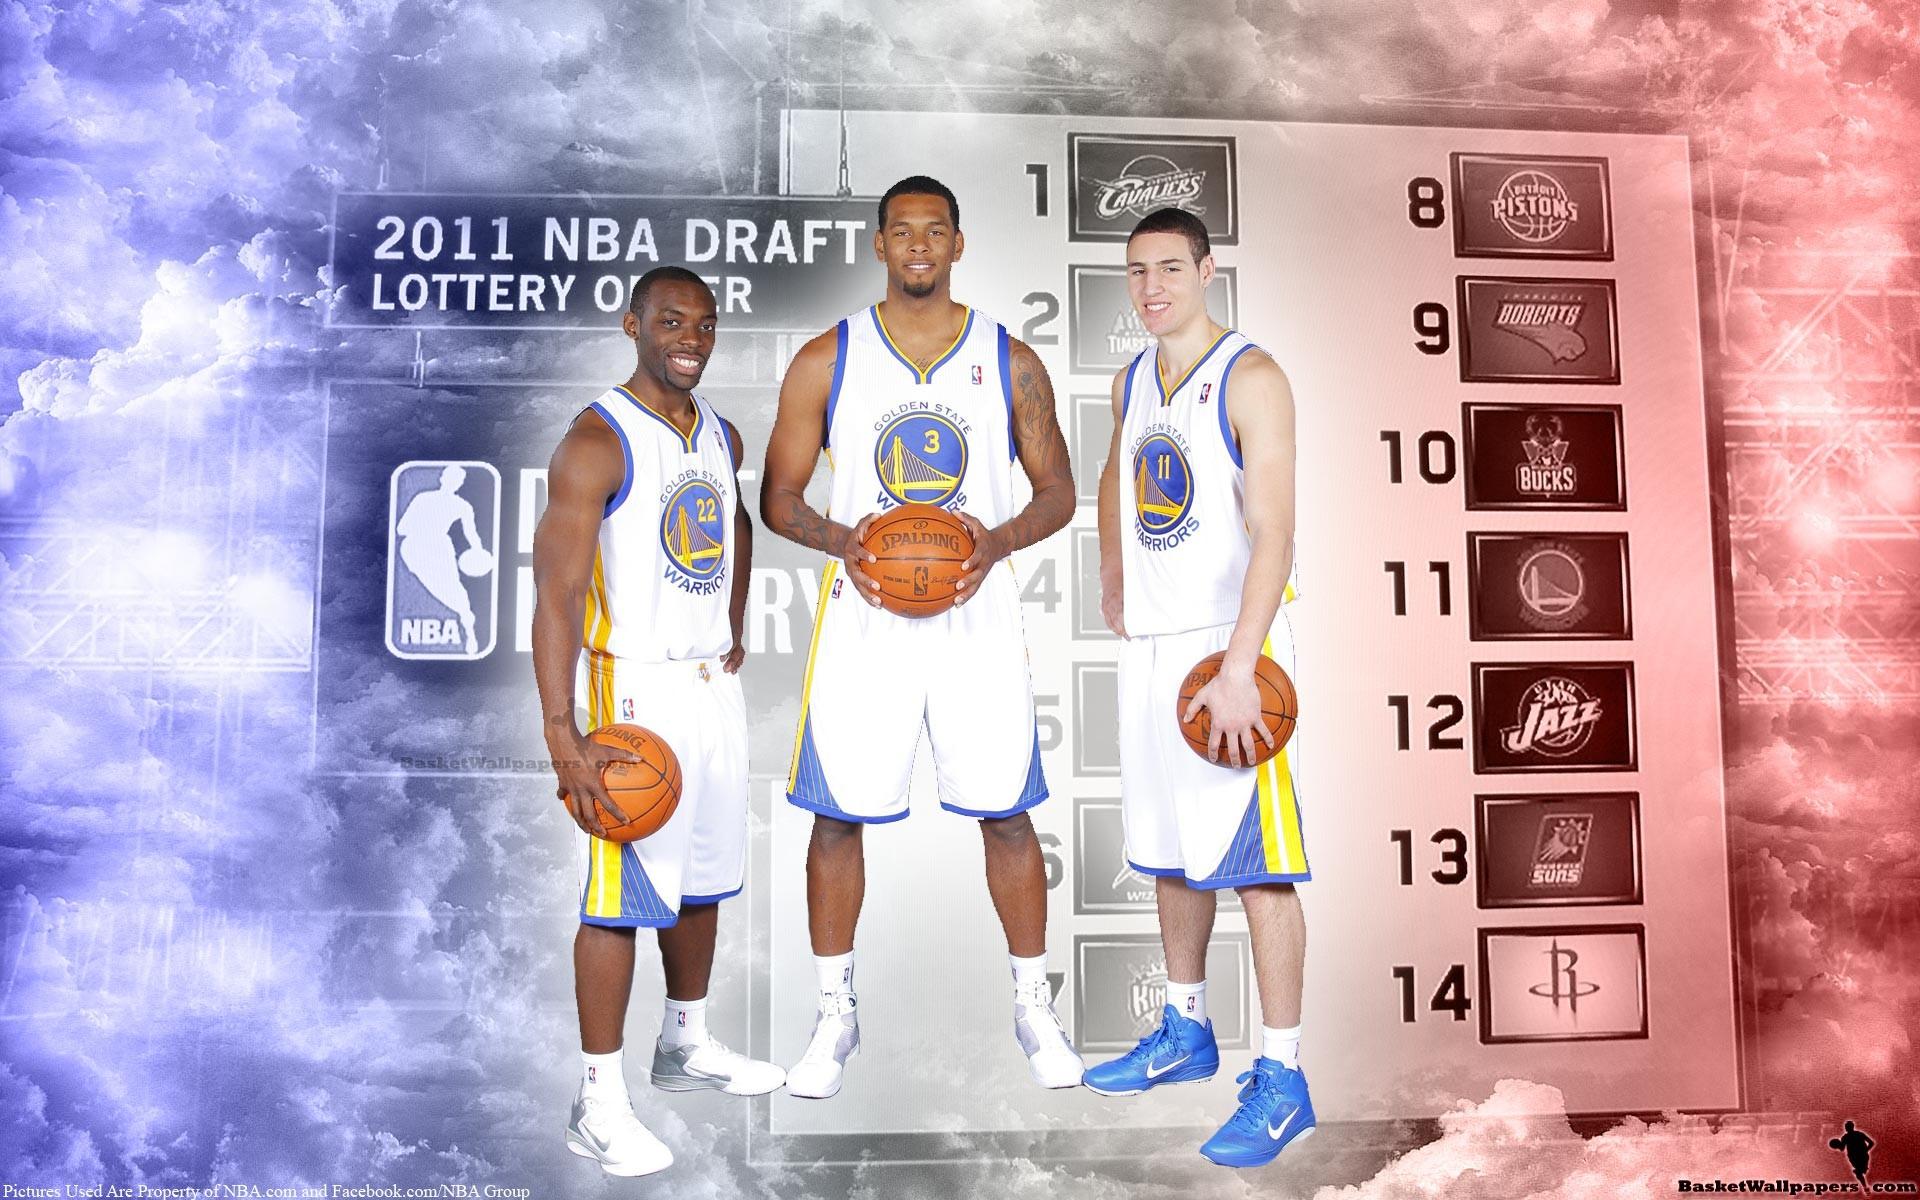 Golden state warriors wallpaper mobile – Golden State Warriors Nba  Basketball Three Players